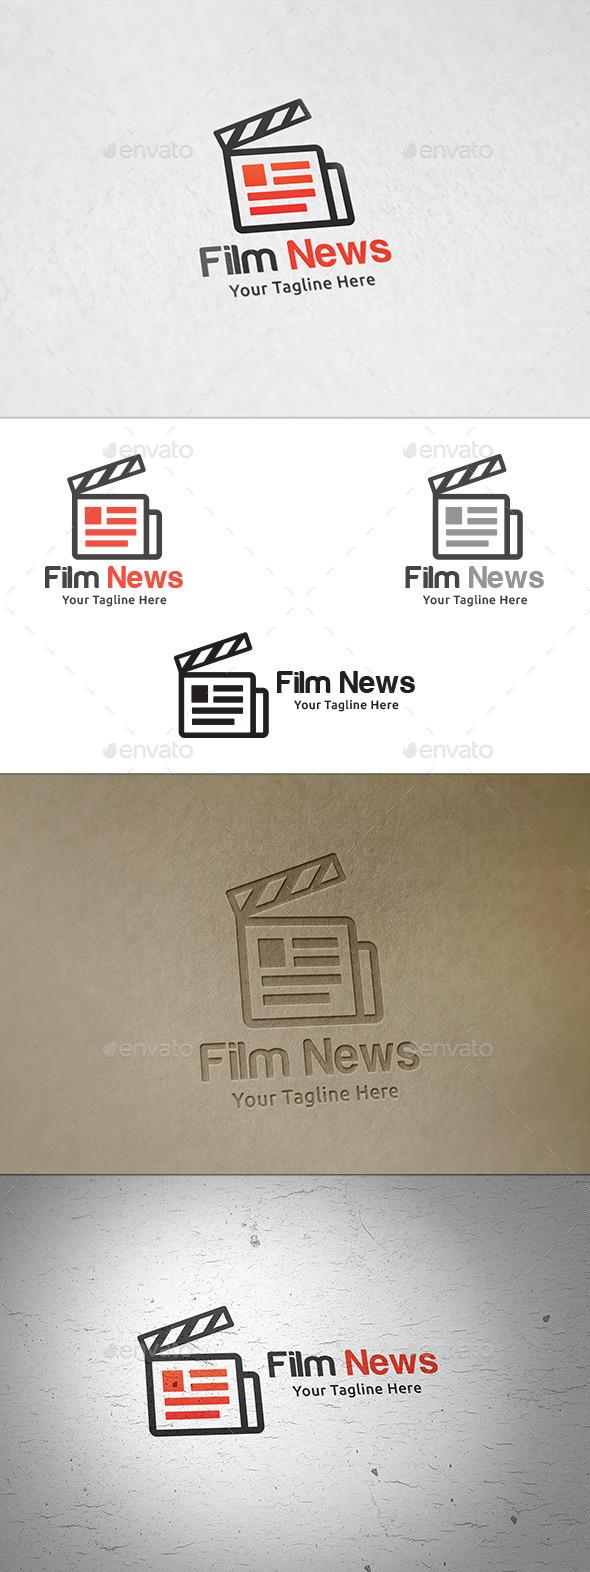 Film News - Logo Template